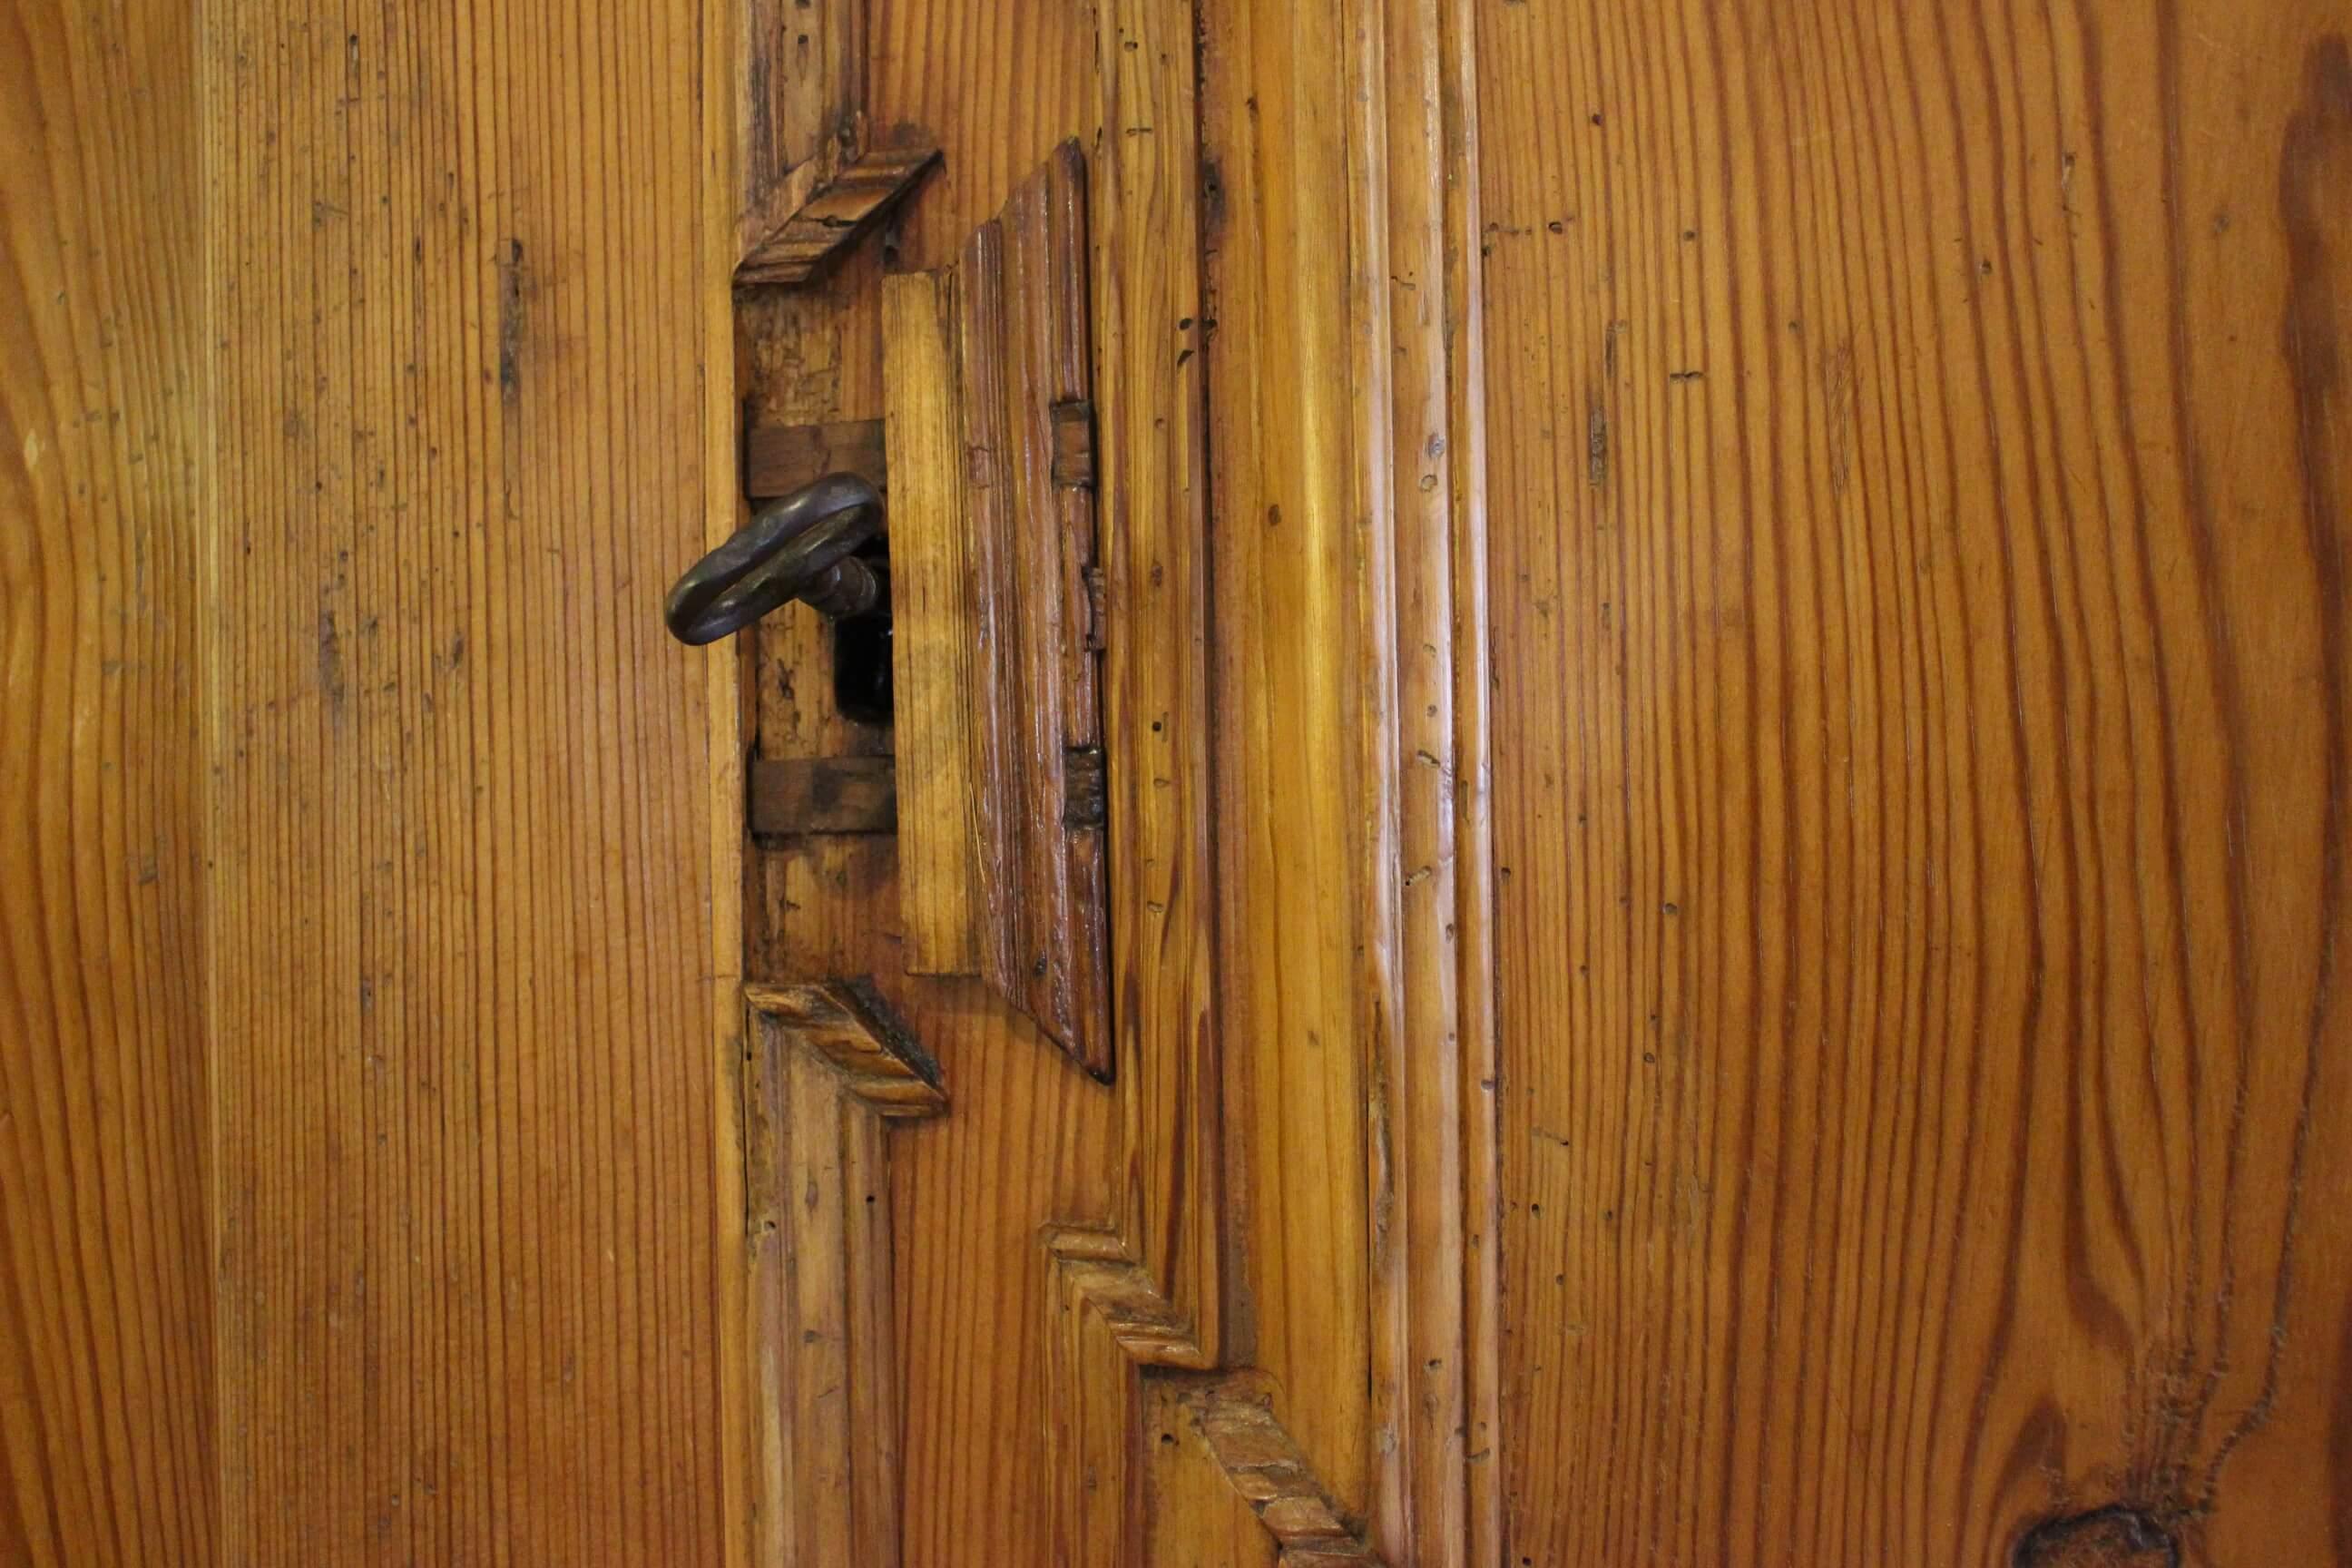 Schrank Barock Dielenschrank Kiefer antik eintürig (Art.-Nr. 0134)